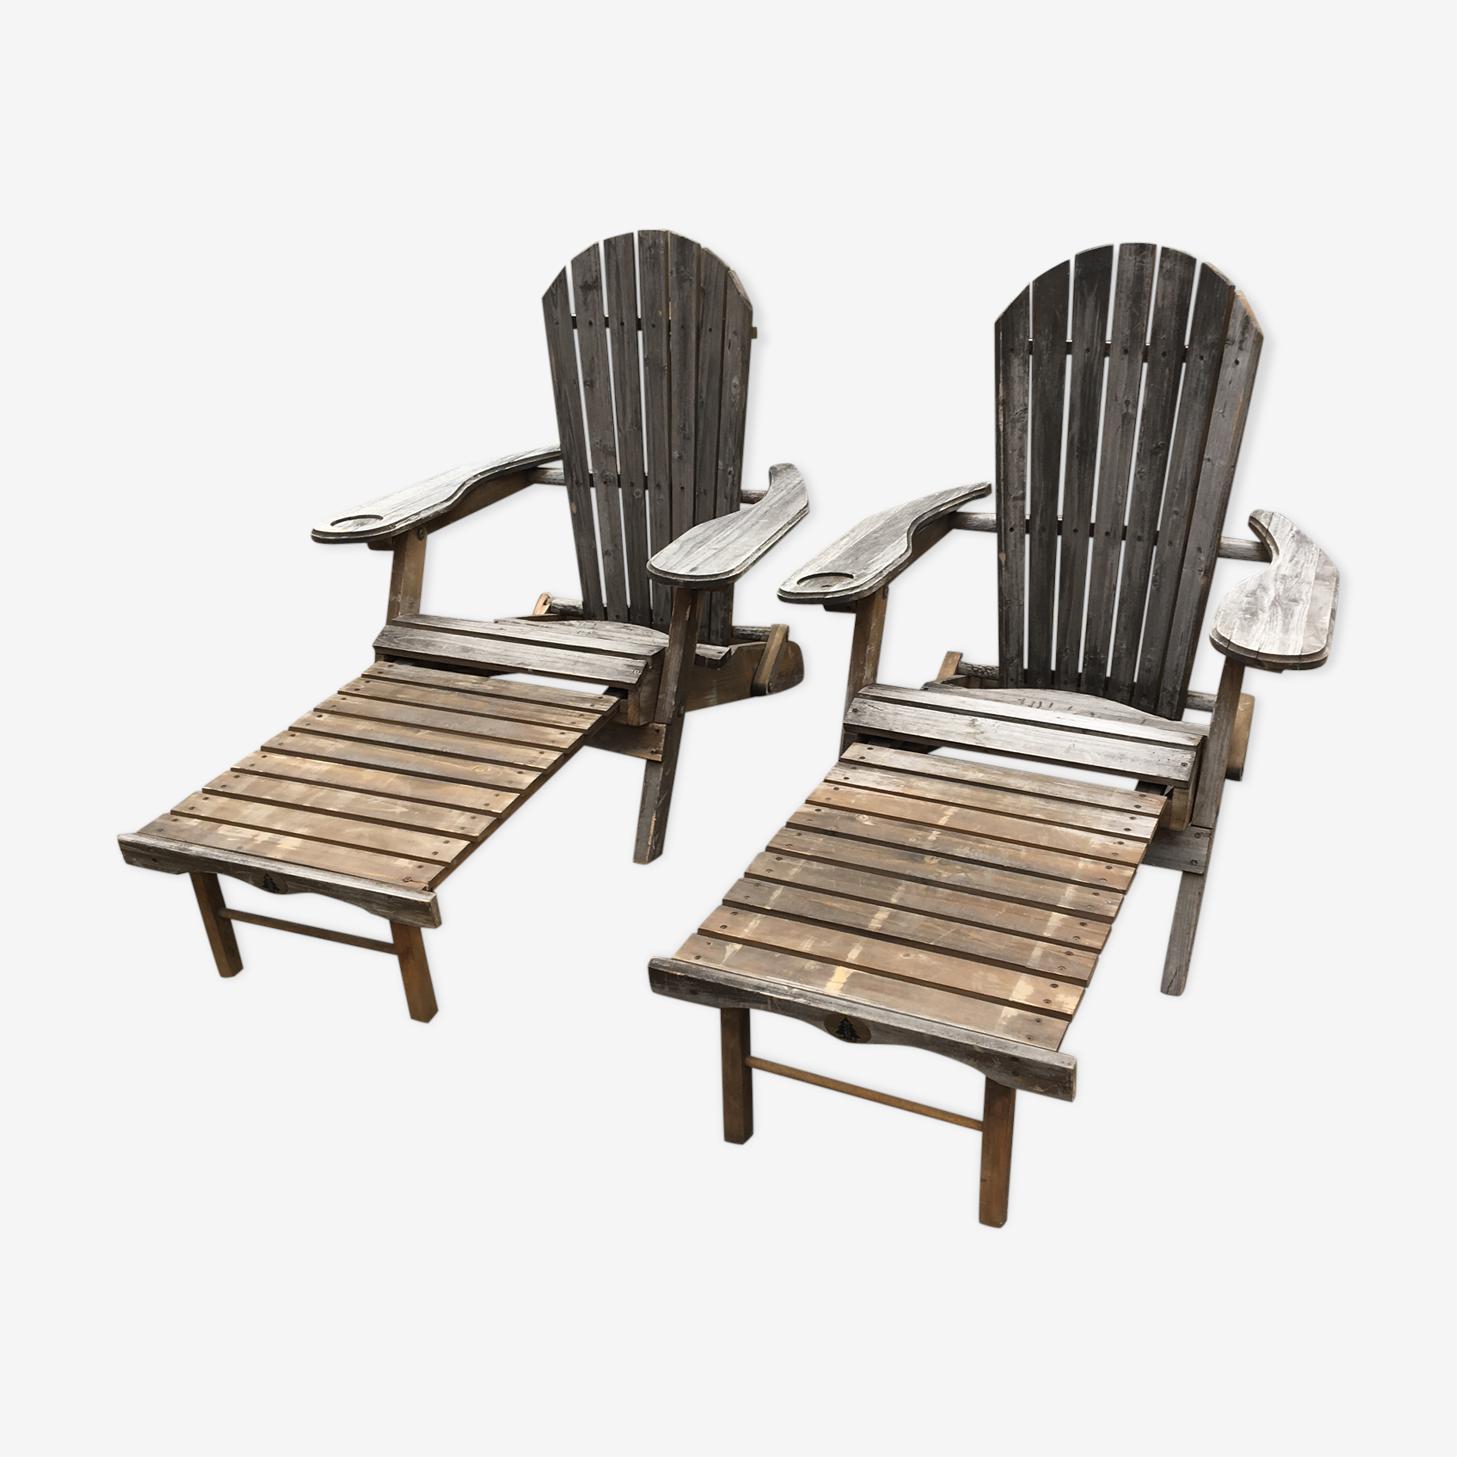 2 fauteuils Adirondack